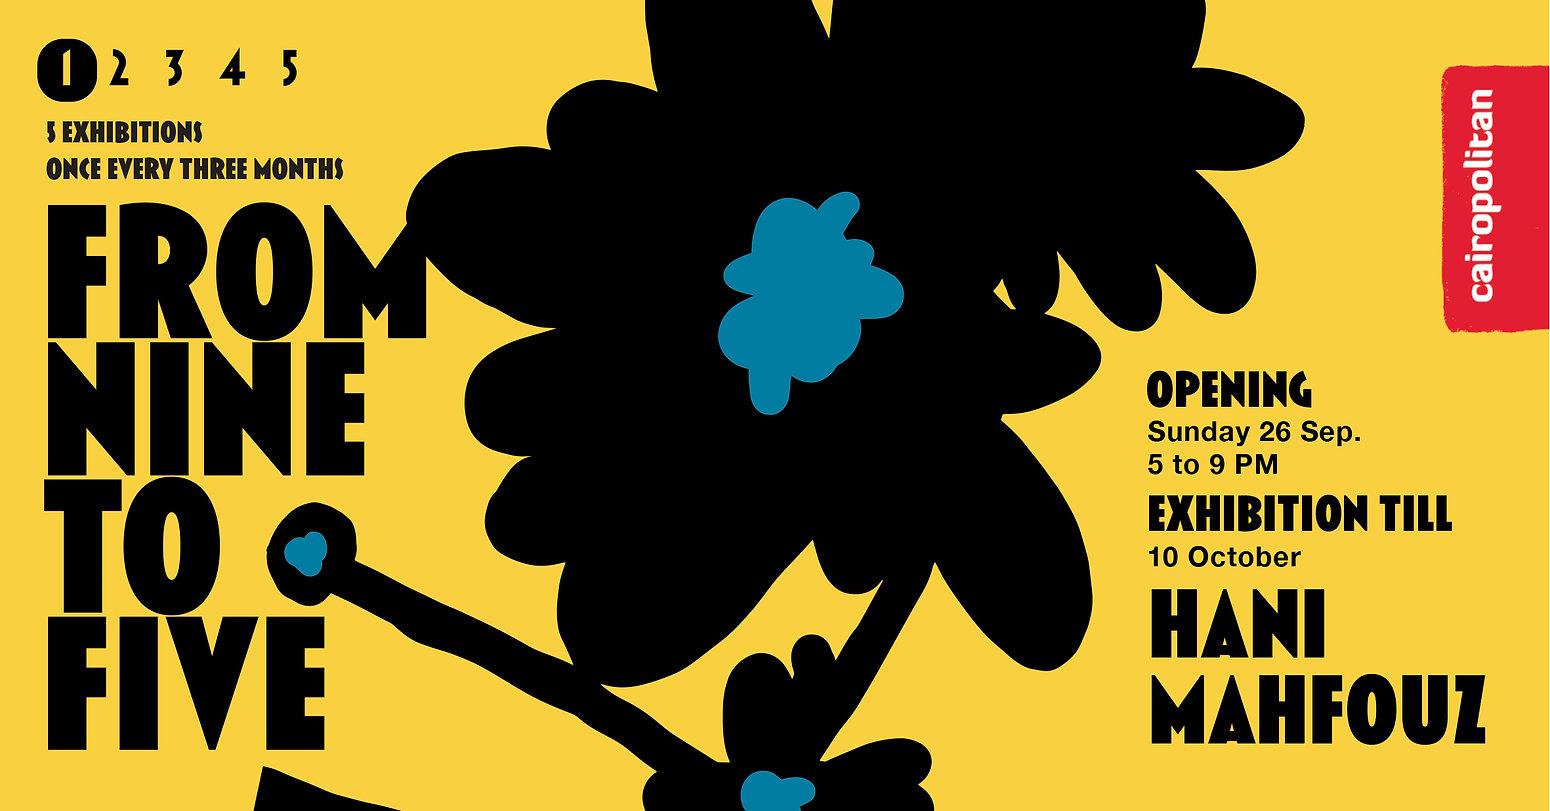 FINAL HANI MAHFOUZ EVENT COVER .jpg